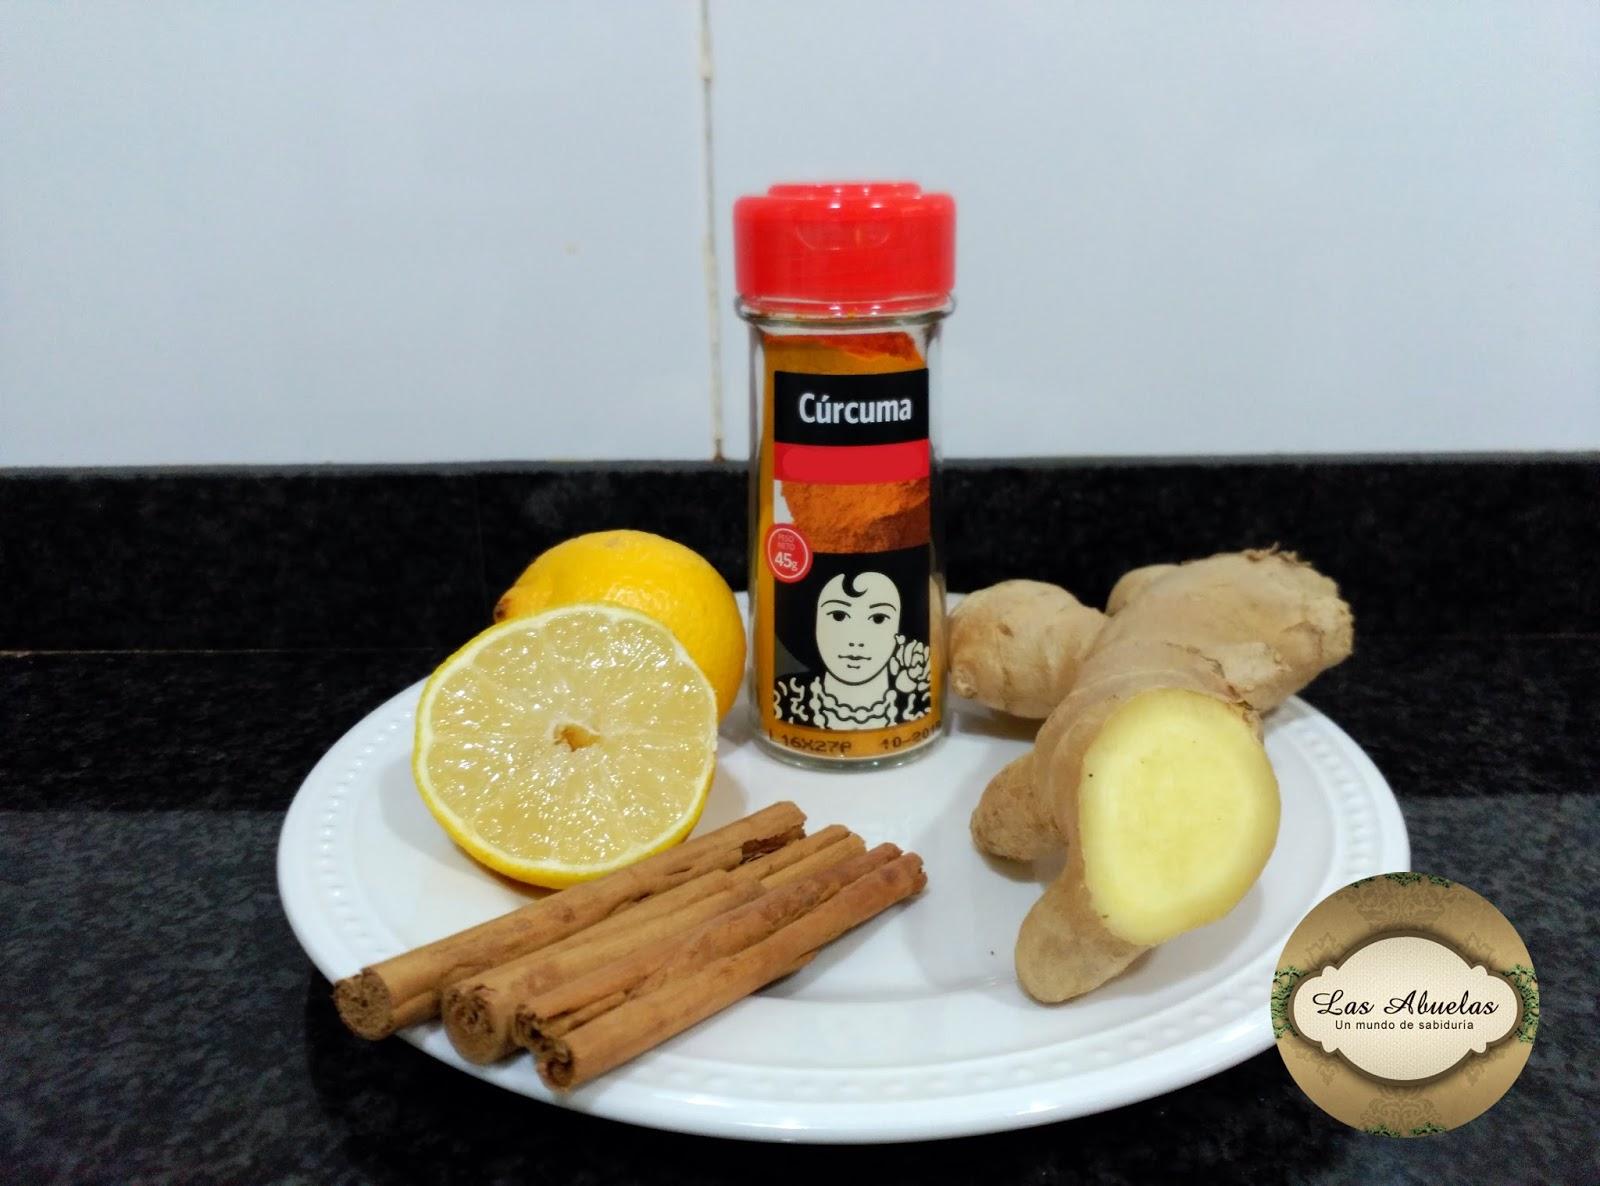 como adelgazar rapido con limon y miel